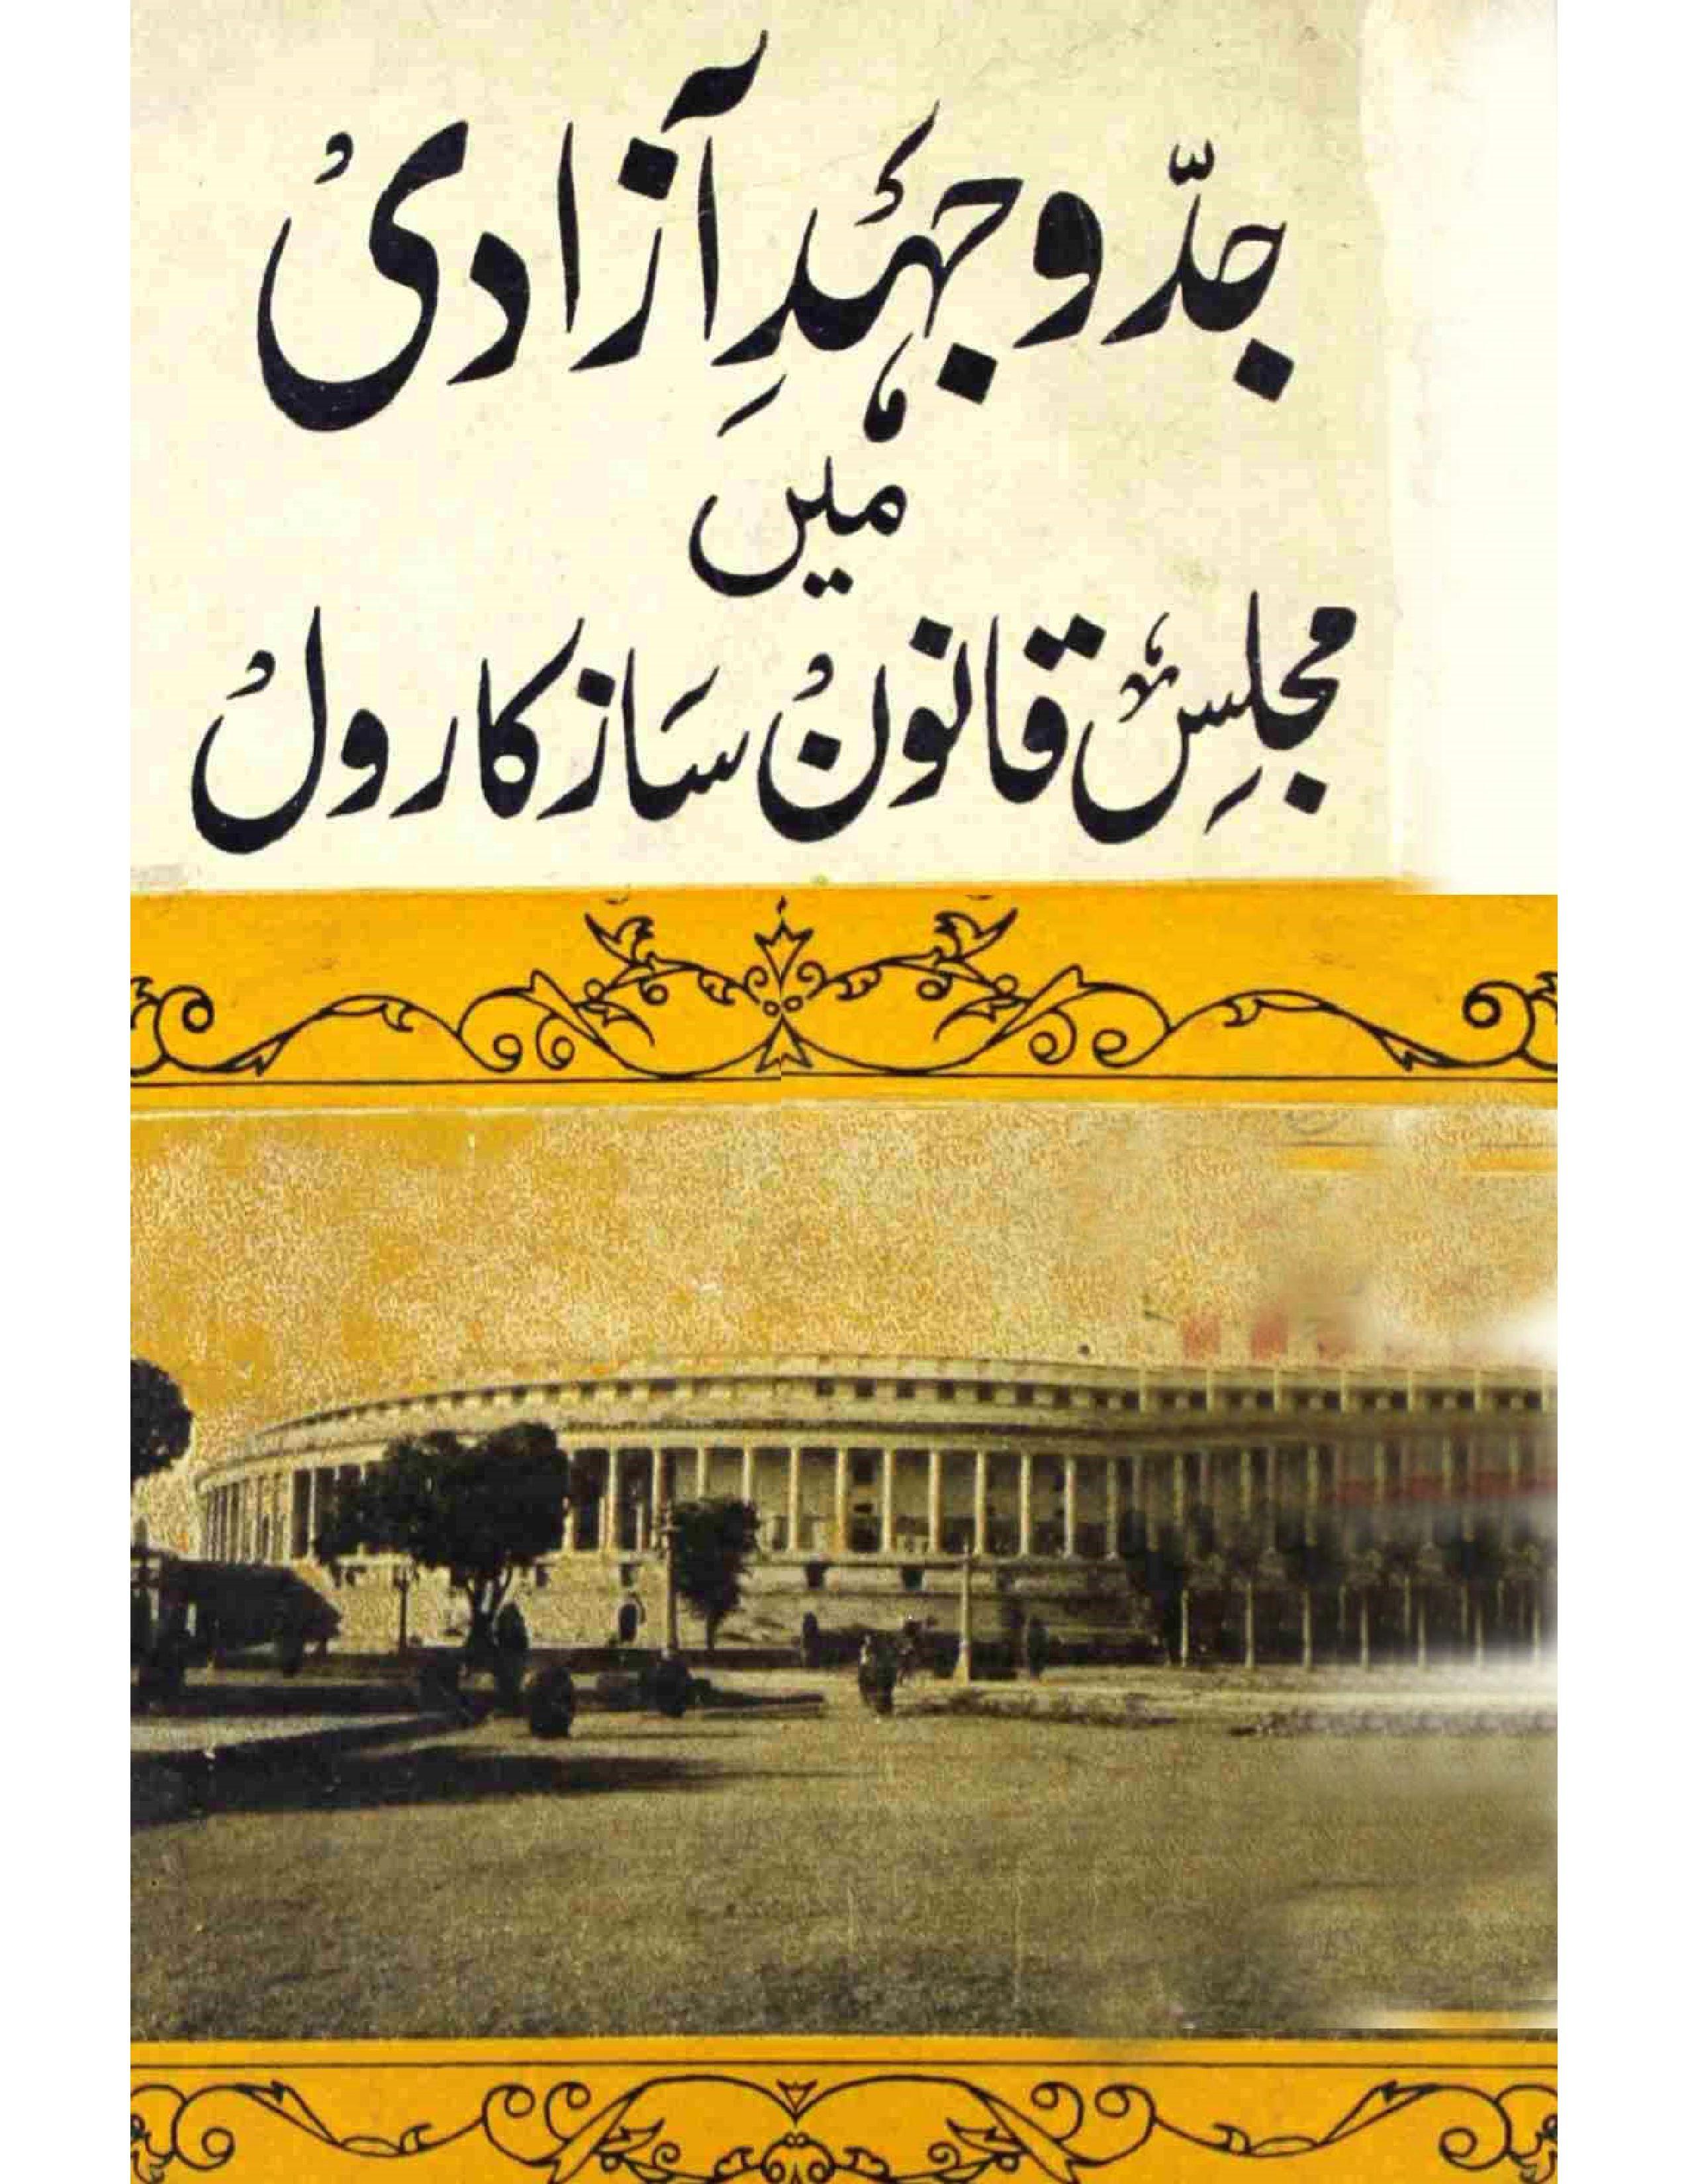 Jidd-o-Jahd-e-Azadi Mein Majlis-e-Qanoon Saaz Ka Roll